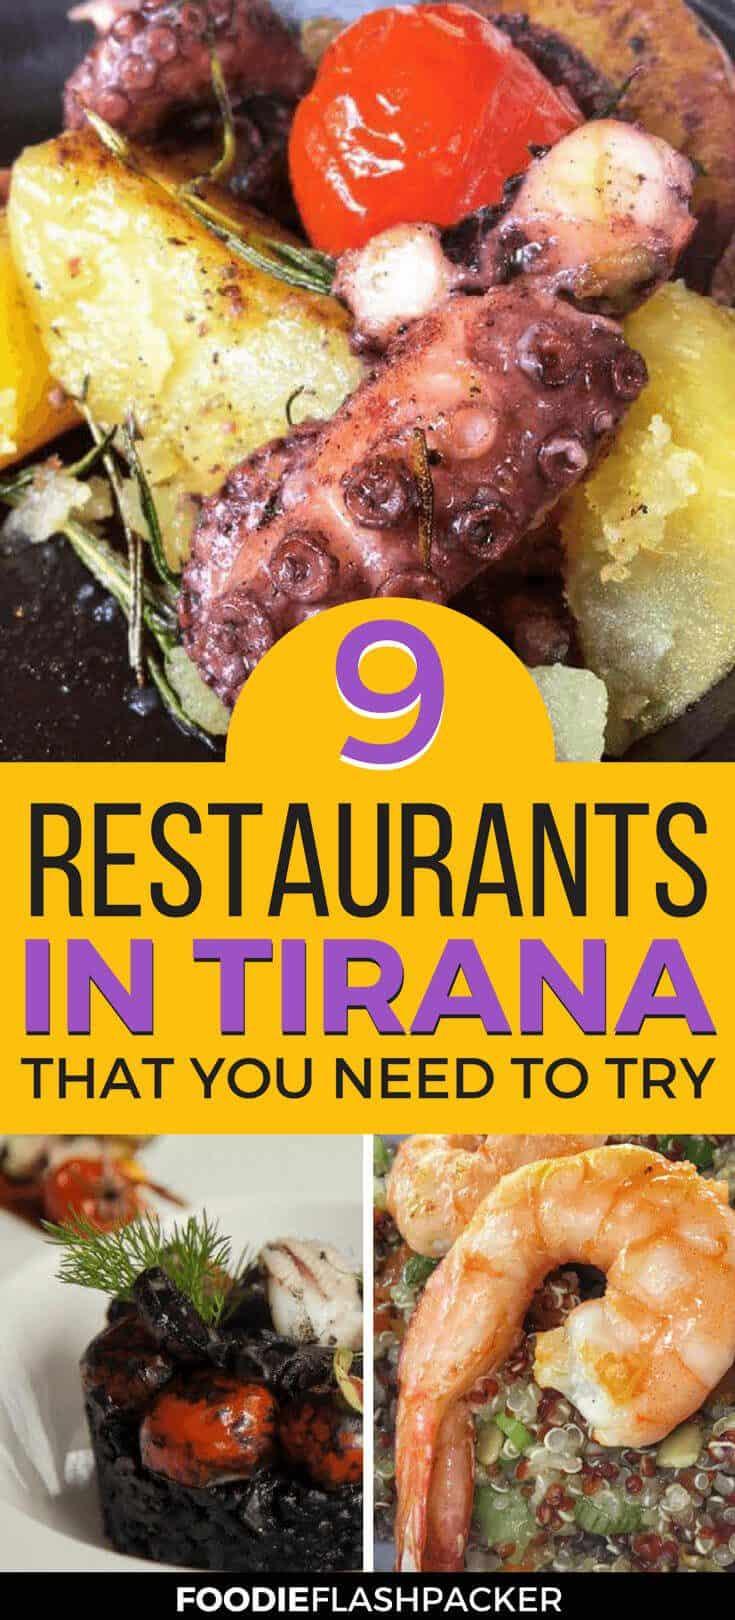 The best restaurants in Tirana, Albania